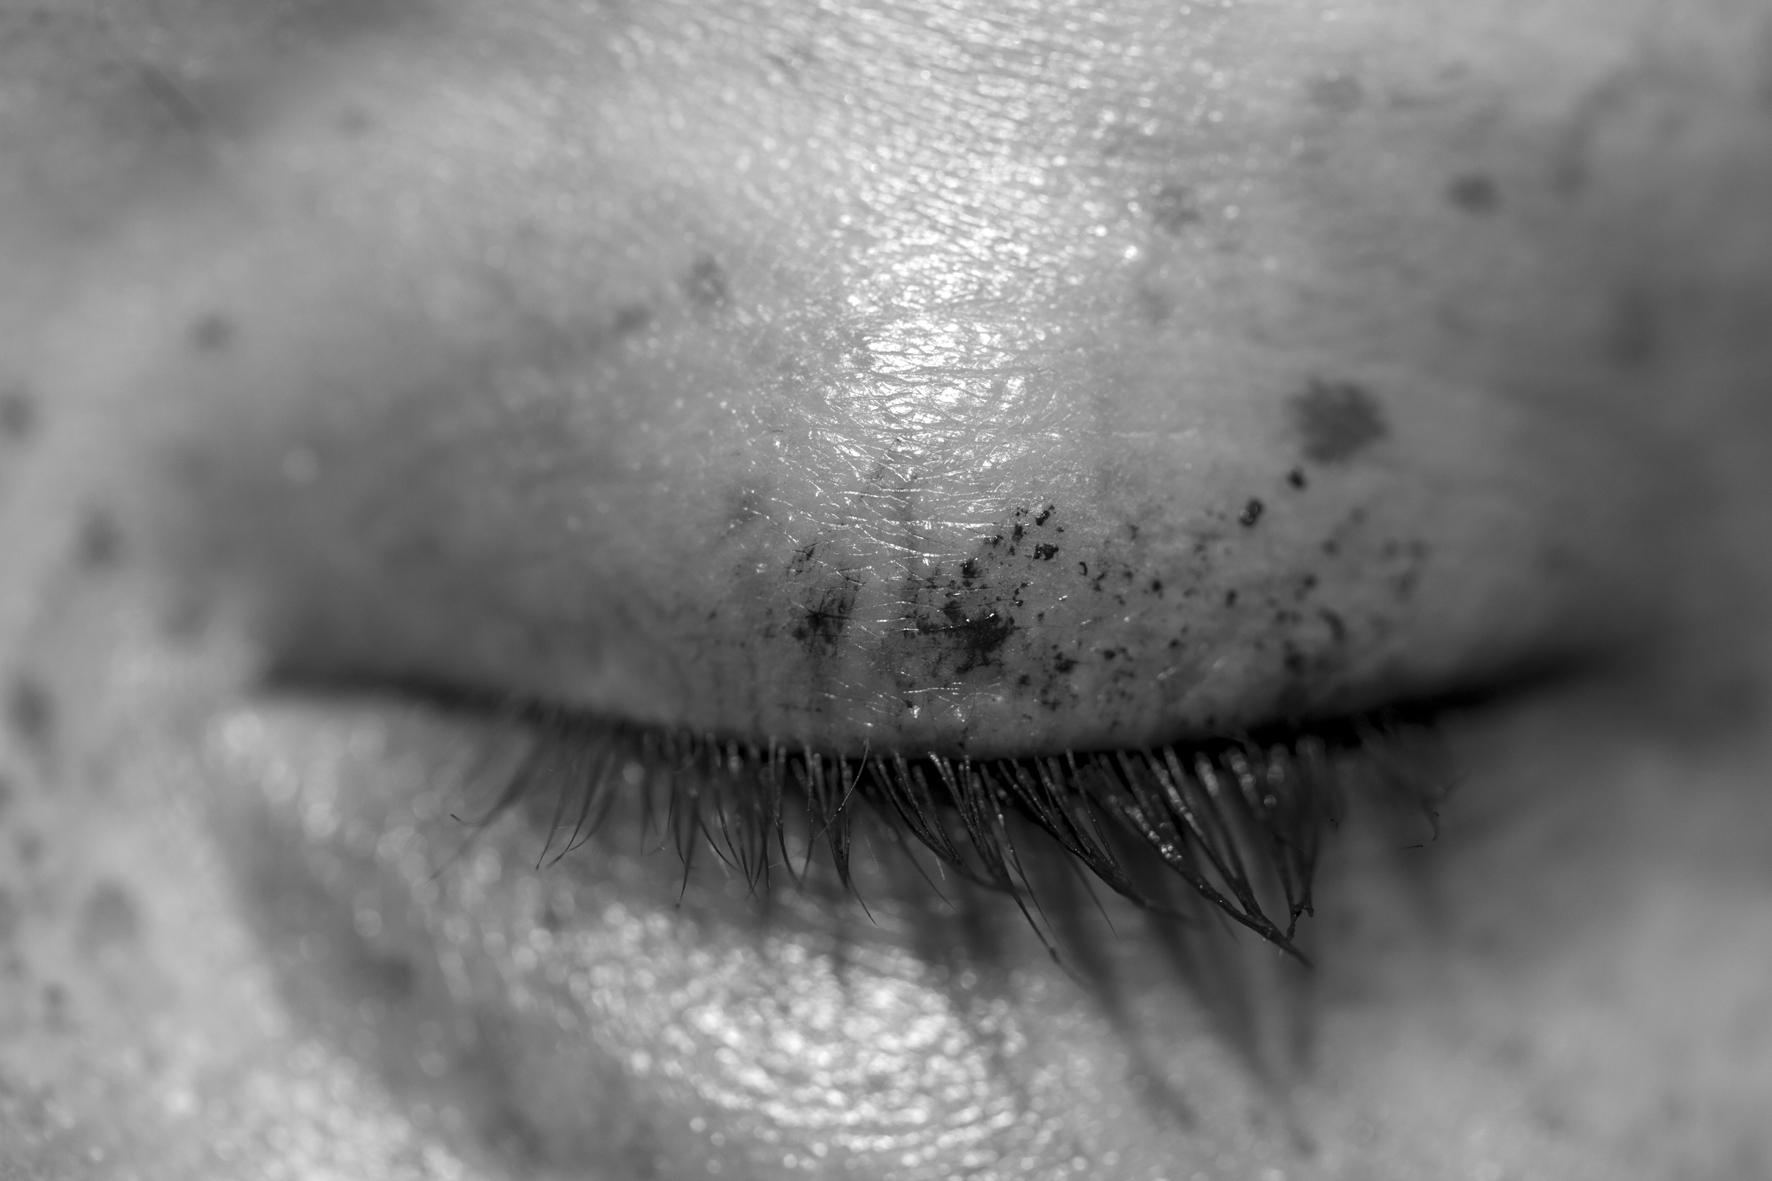 Marko Vuorinen: Until My Heart Bursts #2, 2014. ProSec, 750x500mm.